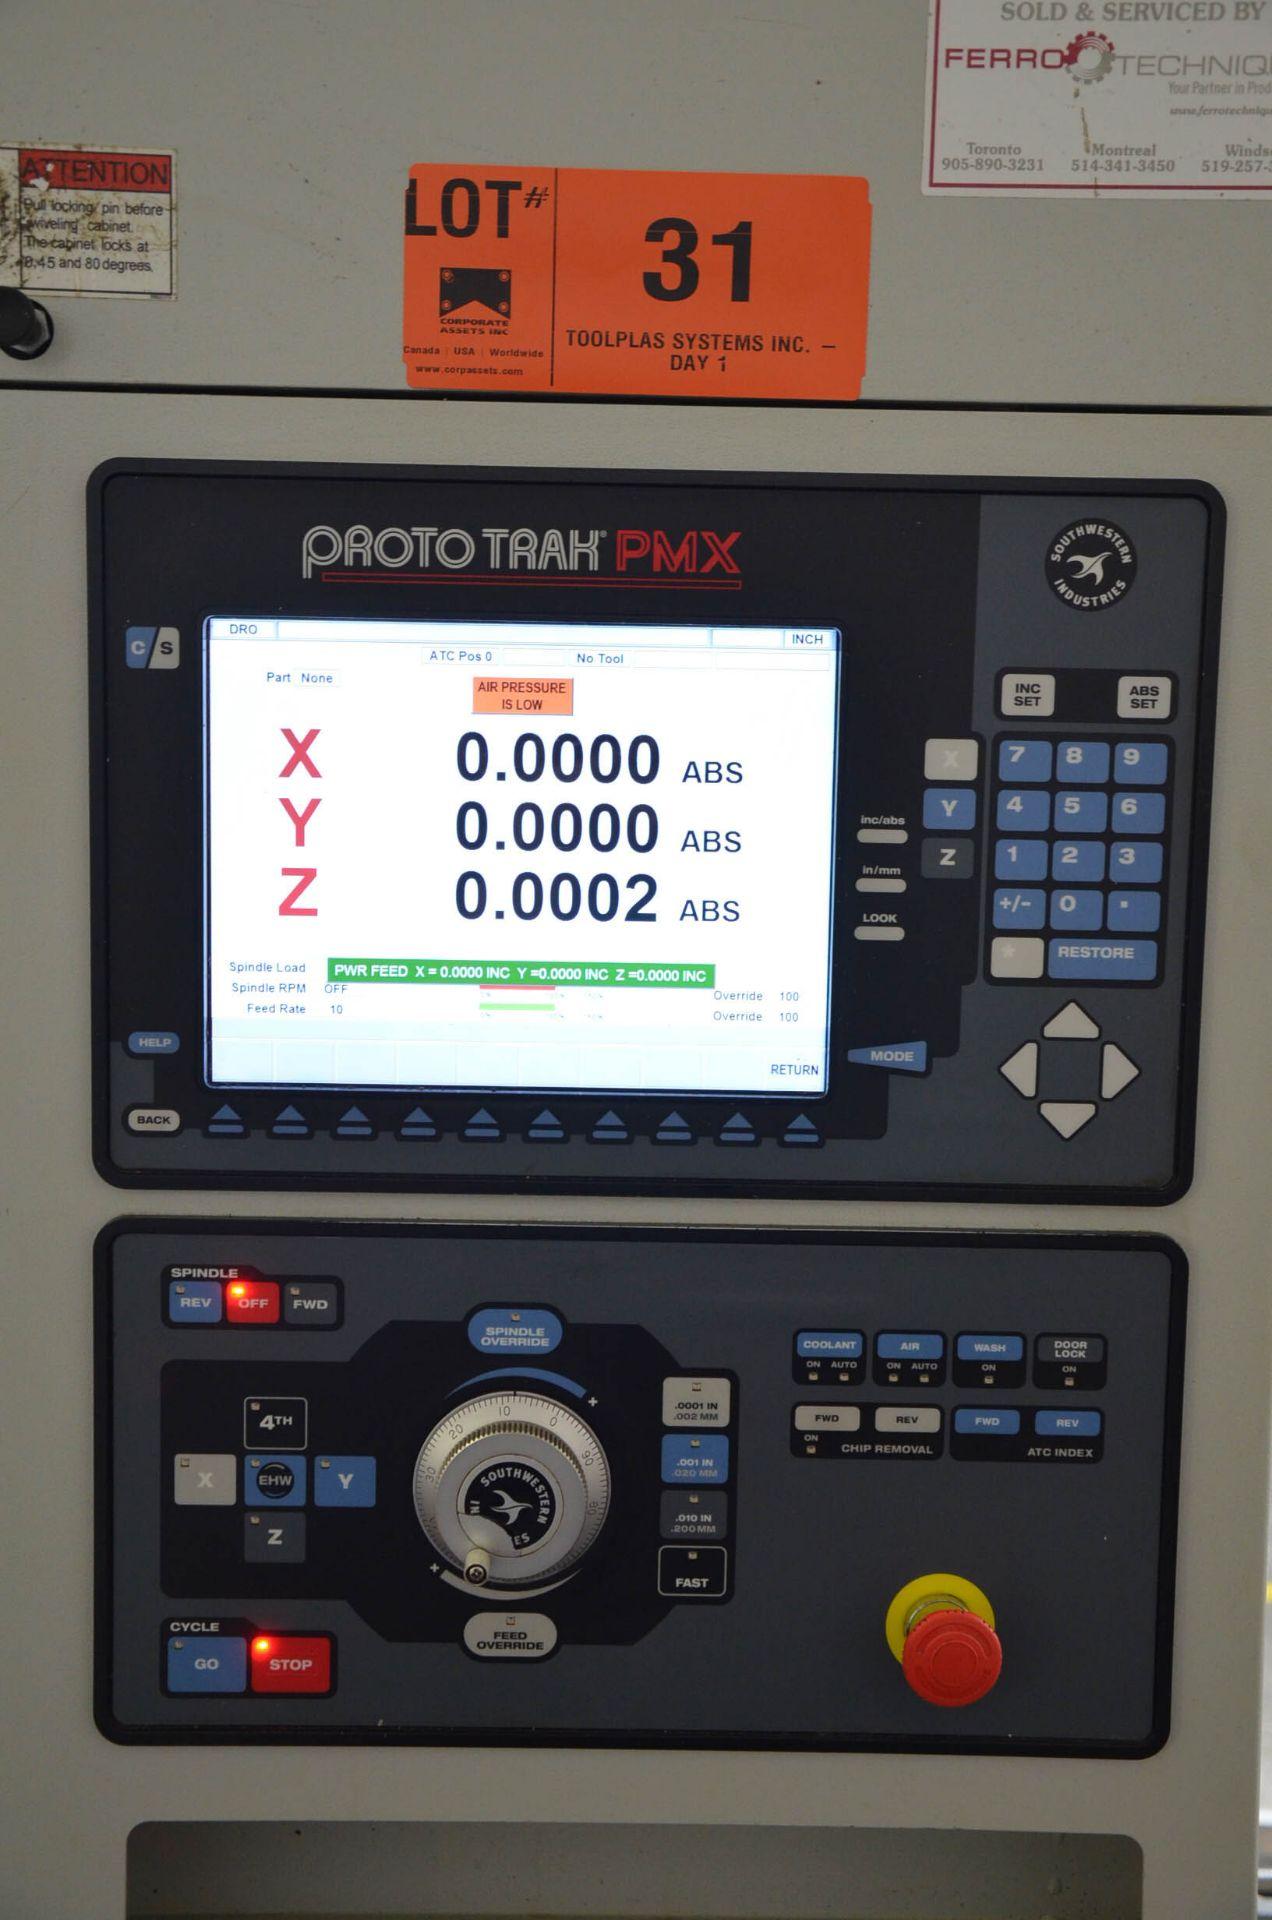 SWI (2014) TRAK LPM 4-AXIS READY CNC VERTICAL MACHINING CENTER WITH PROTO TRAK PMX CNC CONTROL, 19. - Image 6 of 12